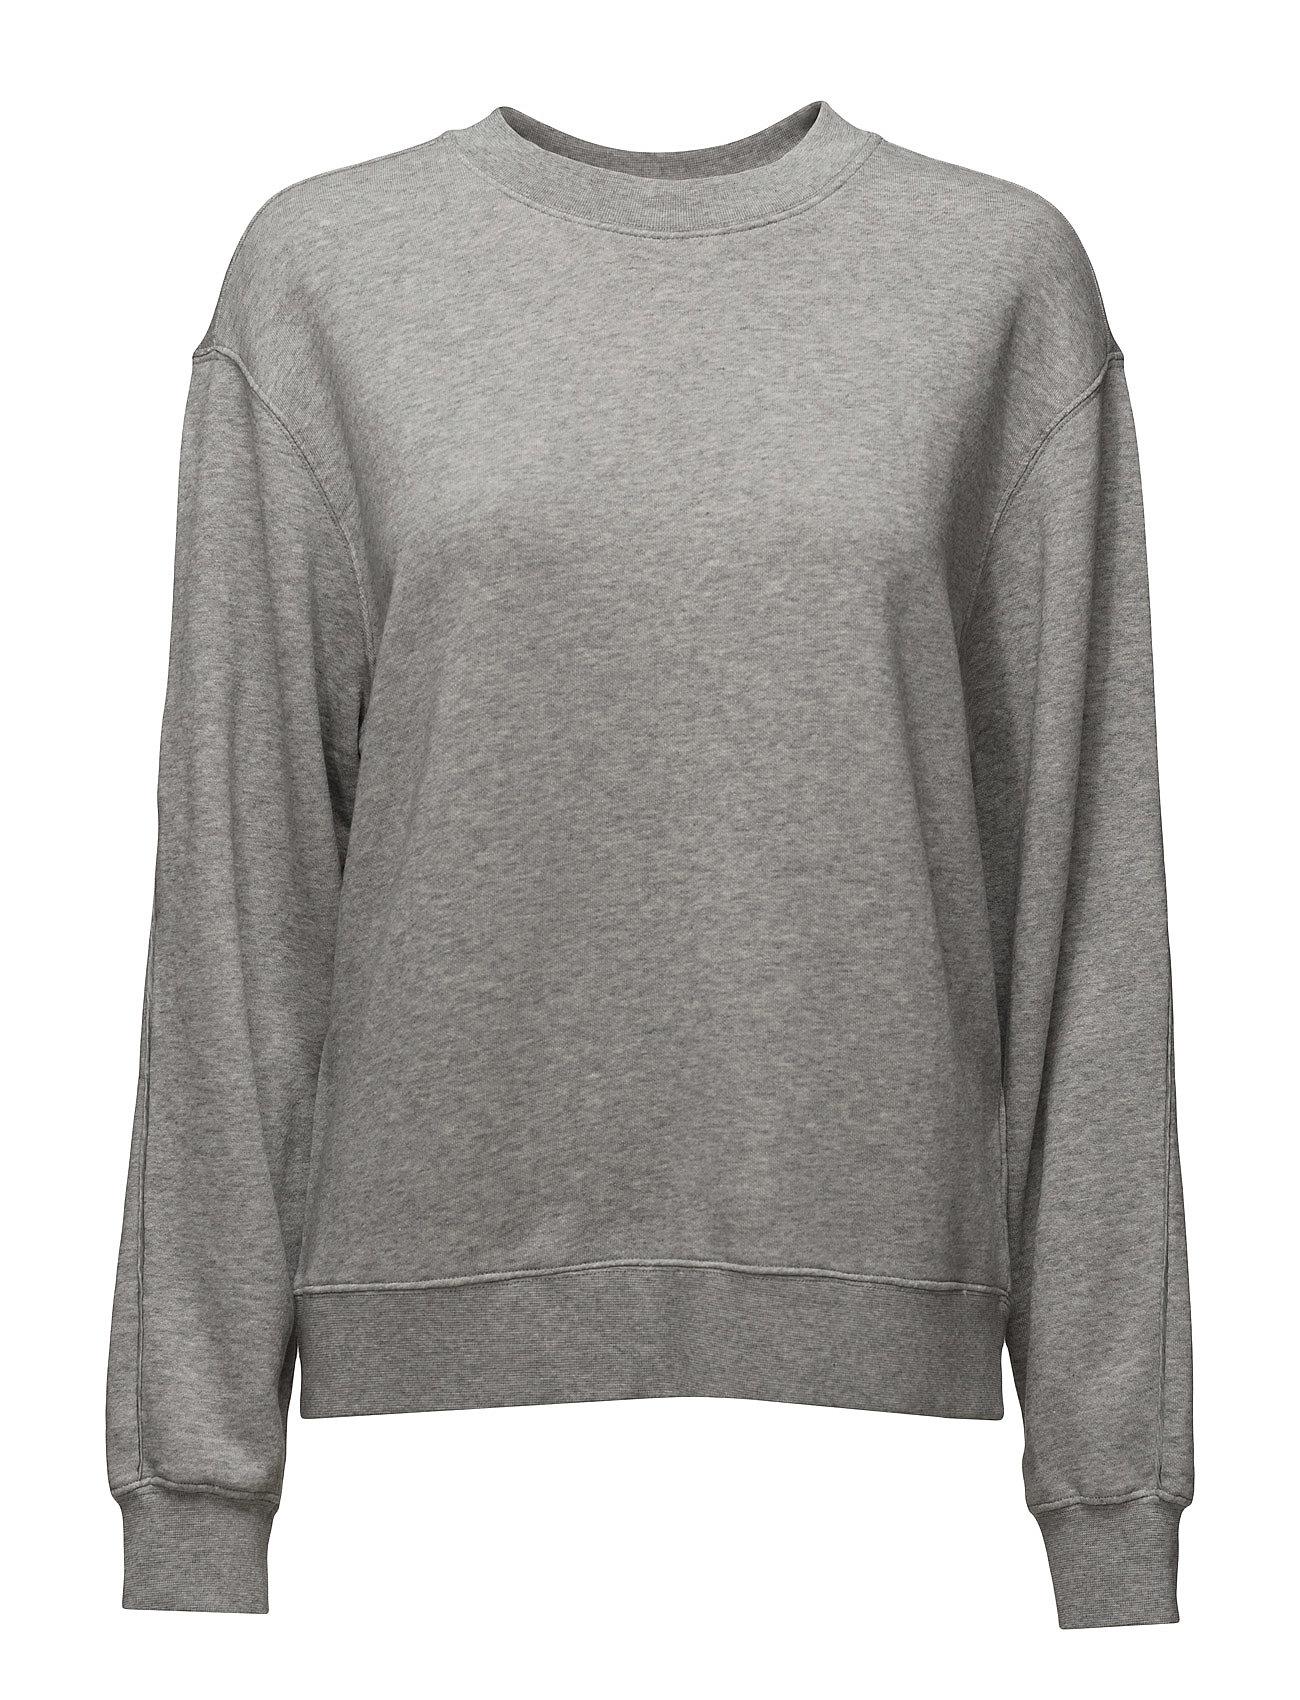 Filippa K Drapey Sweatshirt